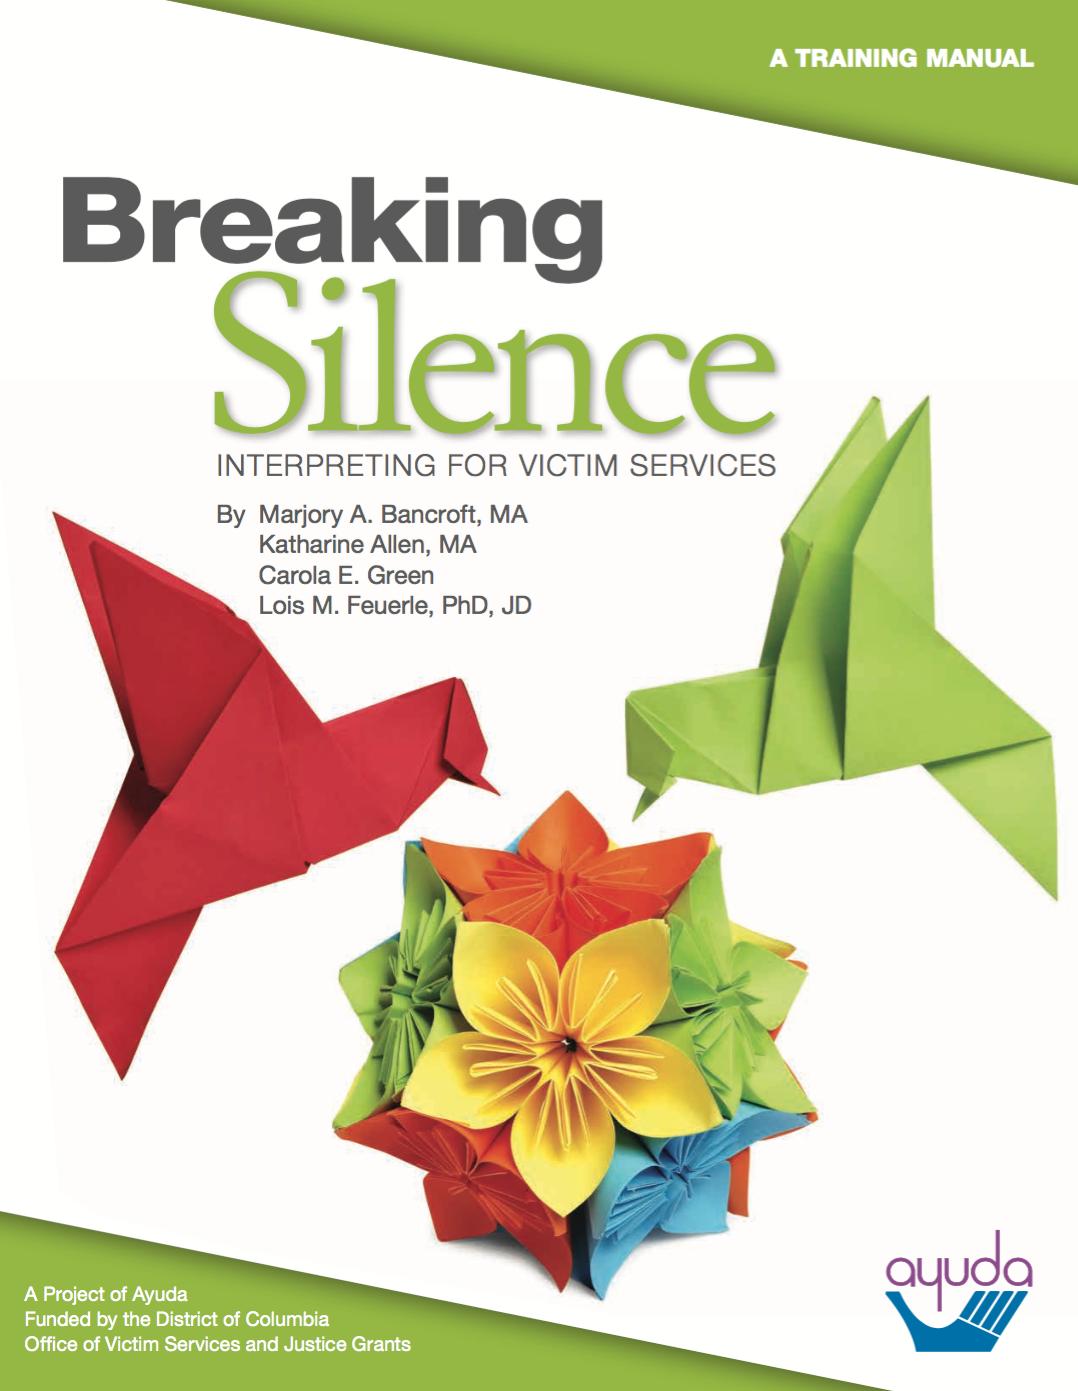 Breaking Silence Manual thumbnail.png